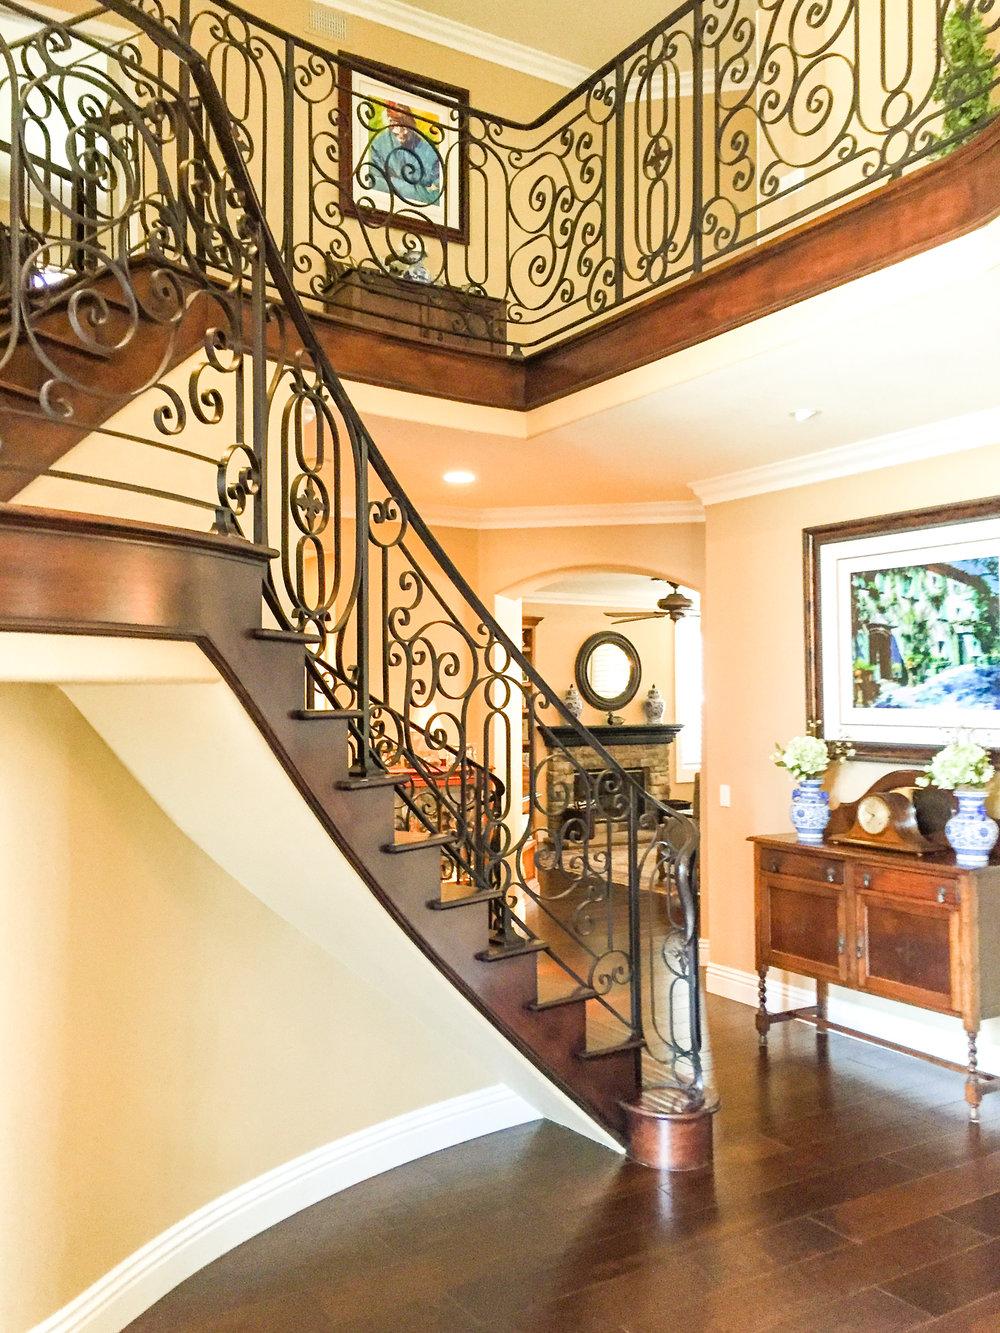 Custom, Hand Forged Ornate Designed Stair Railing in Irvine, California